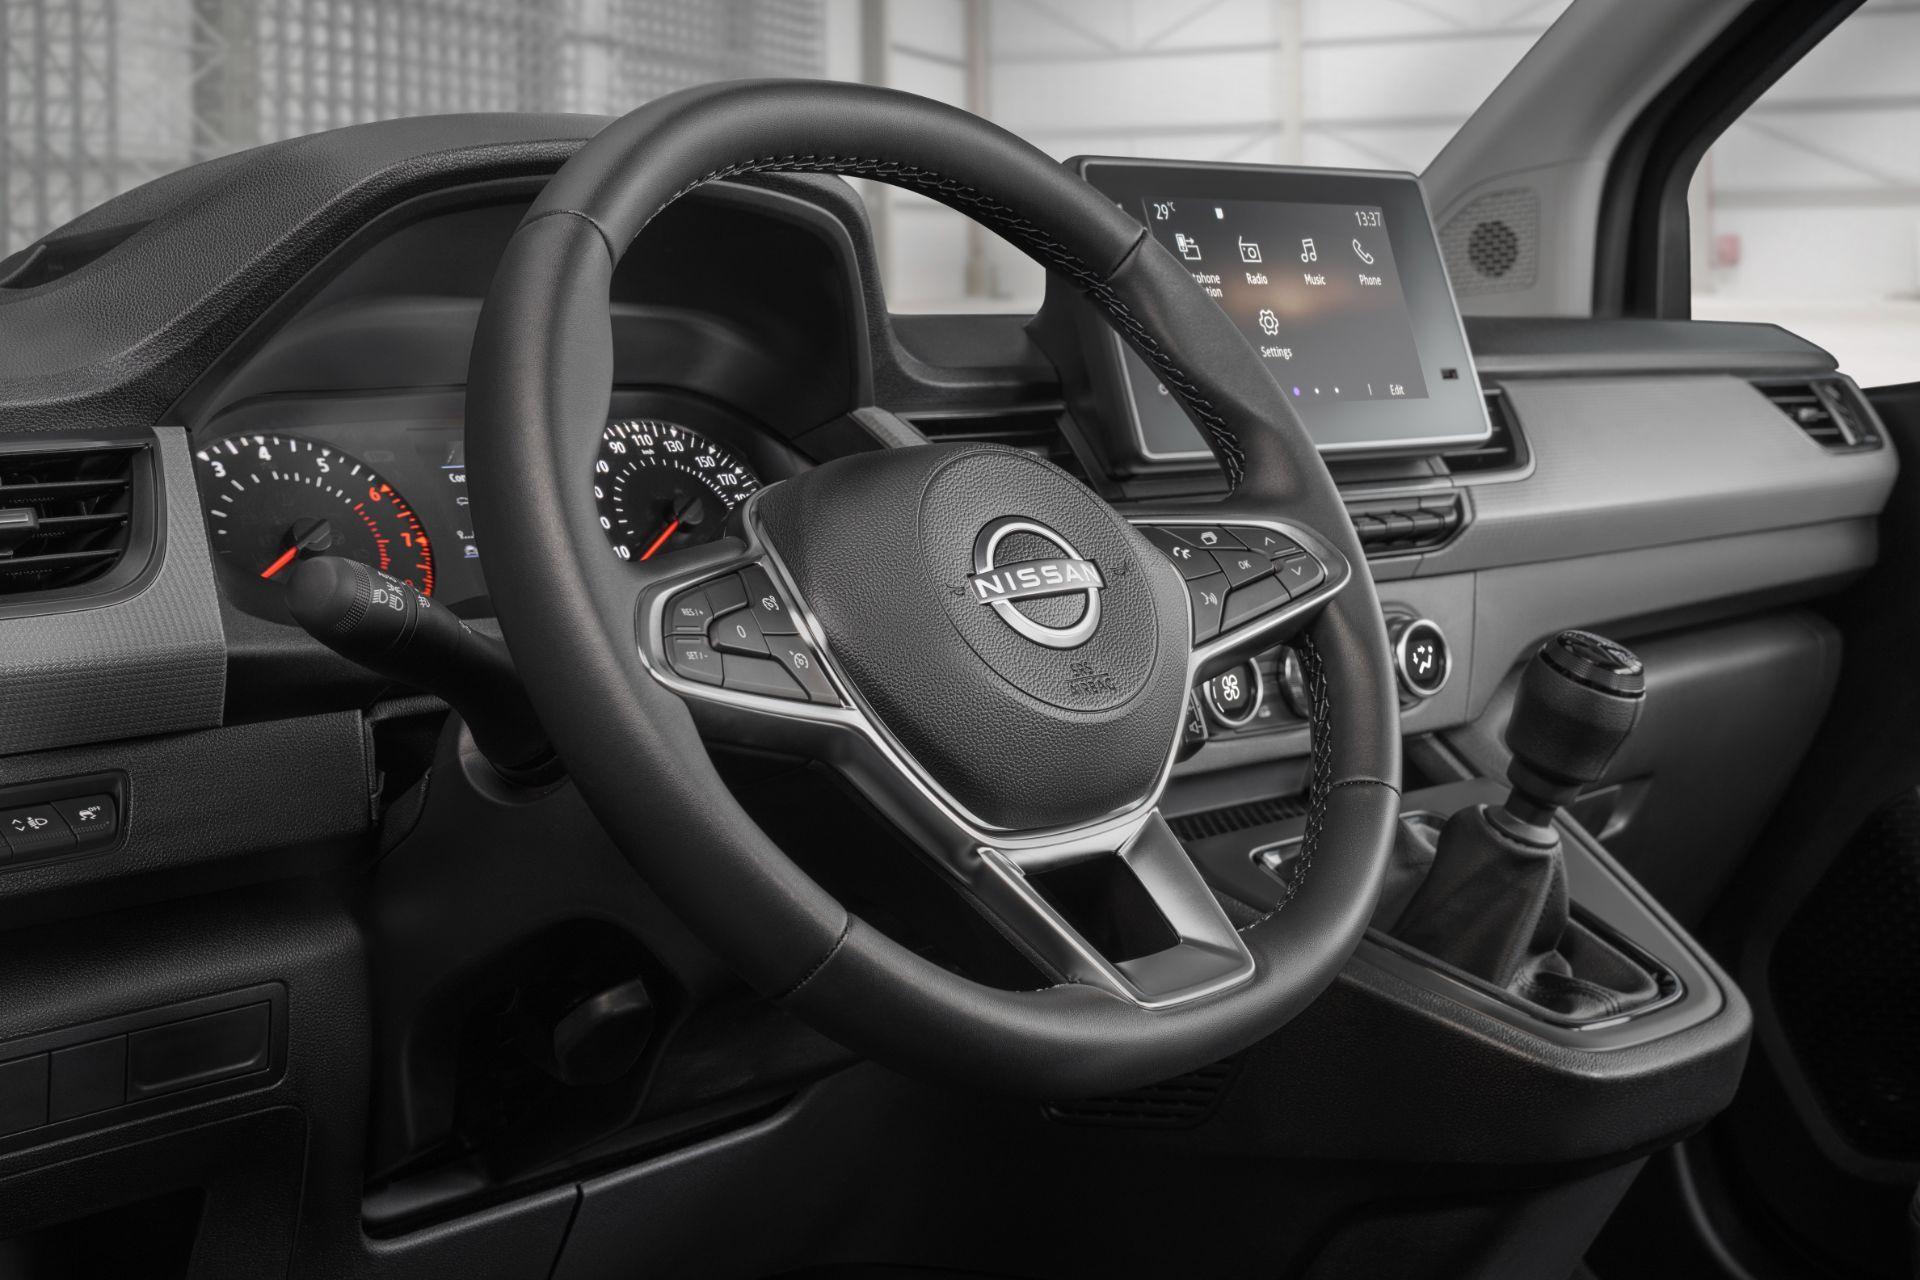 2022-Nissan-Townstar-petrol-van-dynamic-16